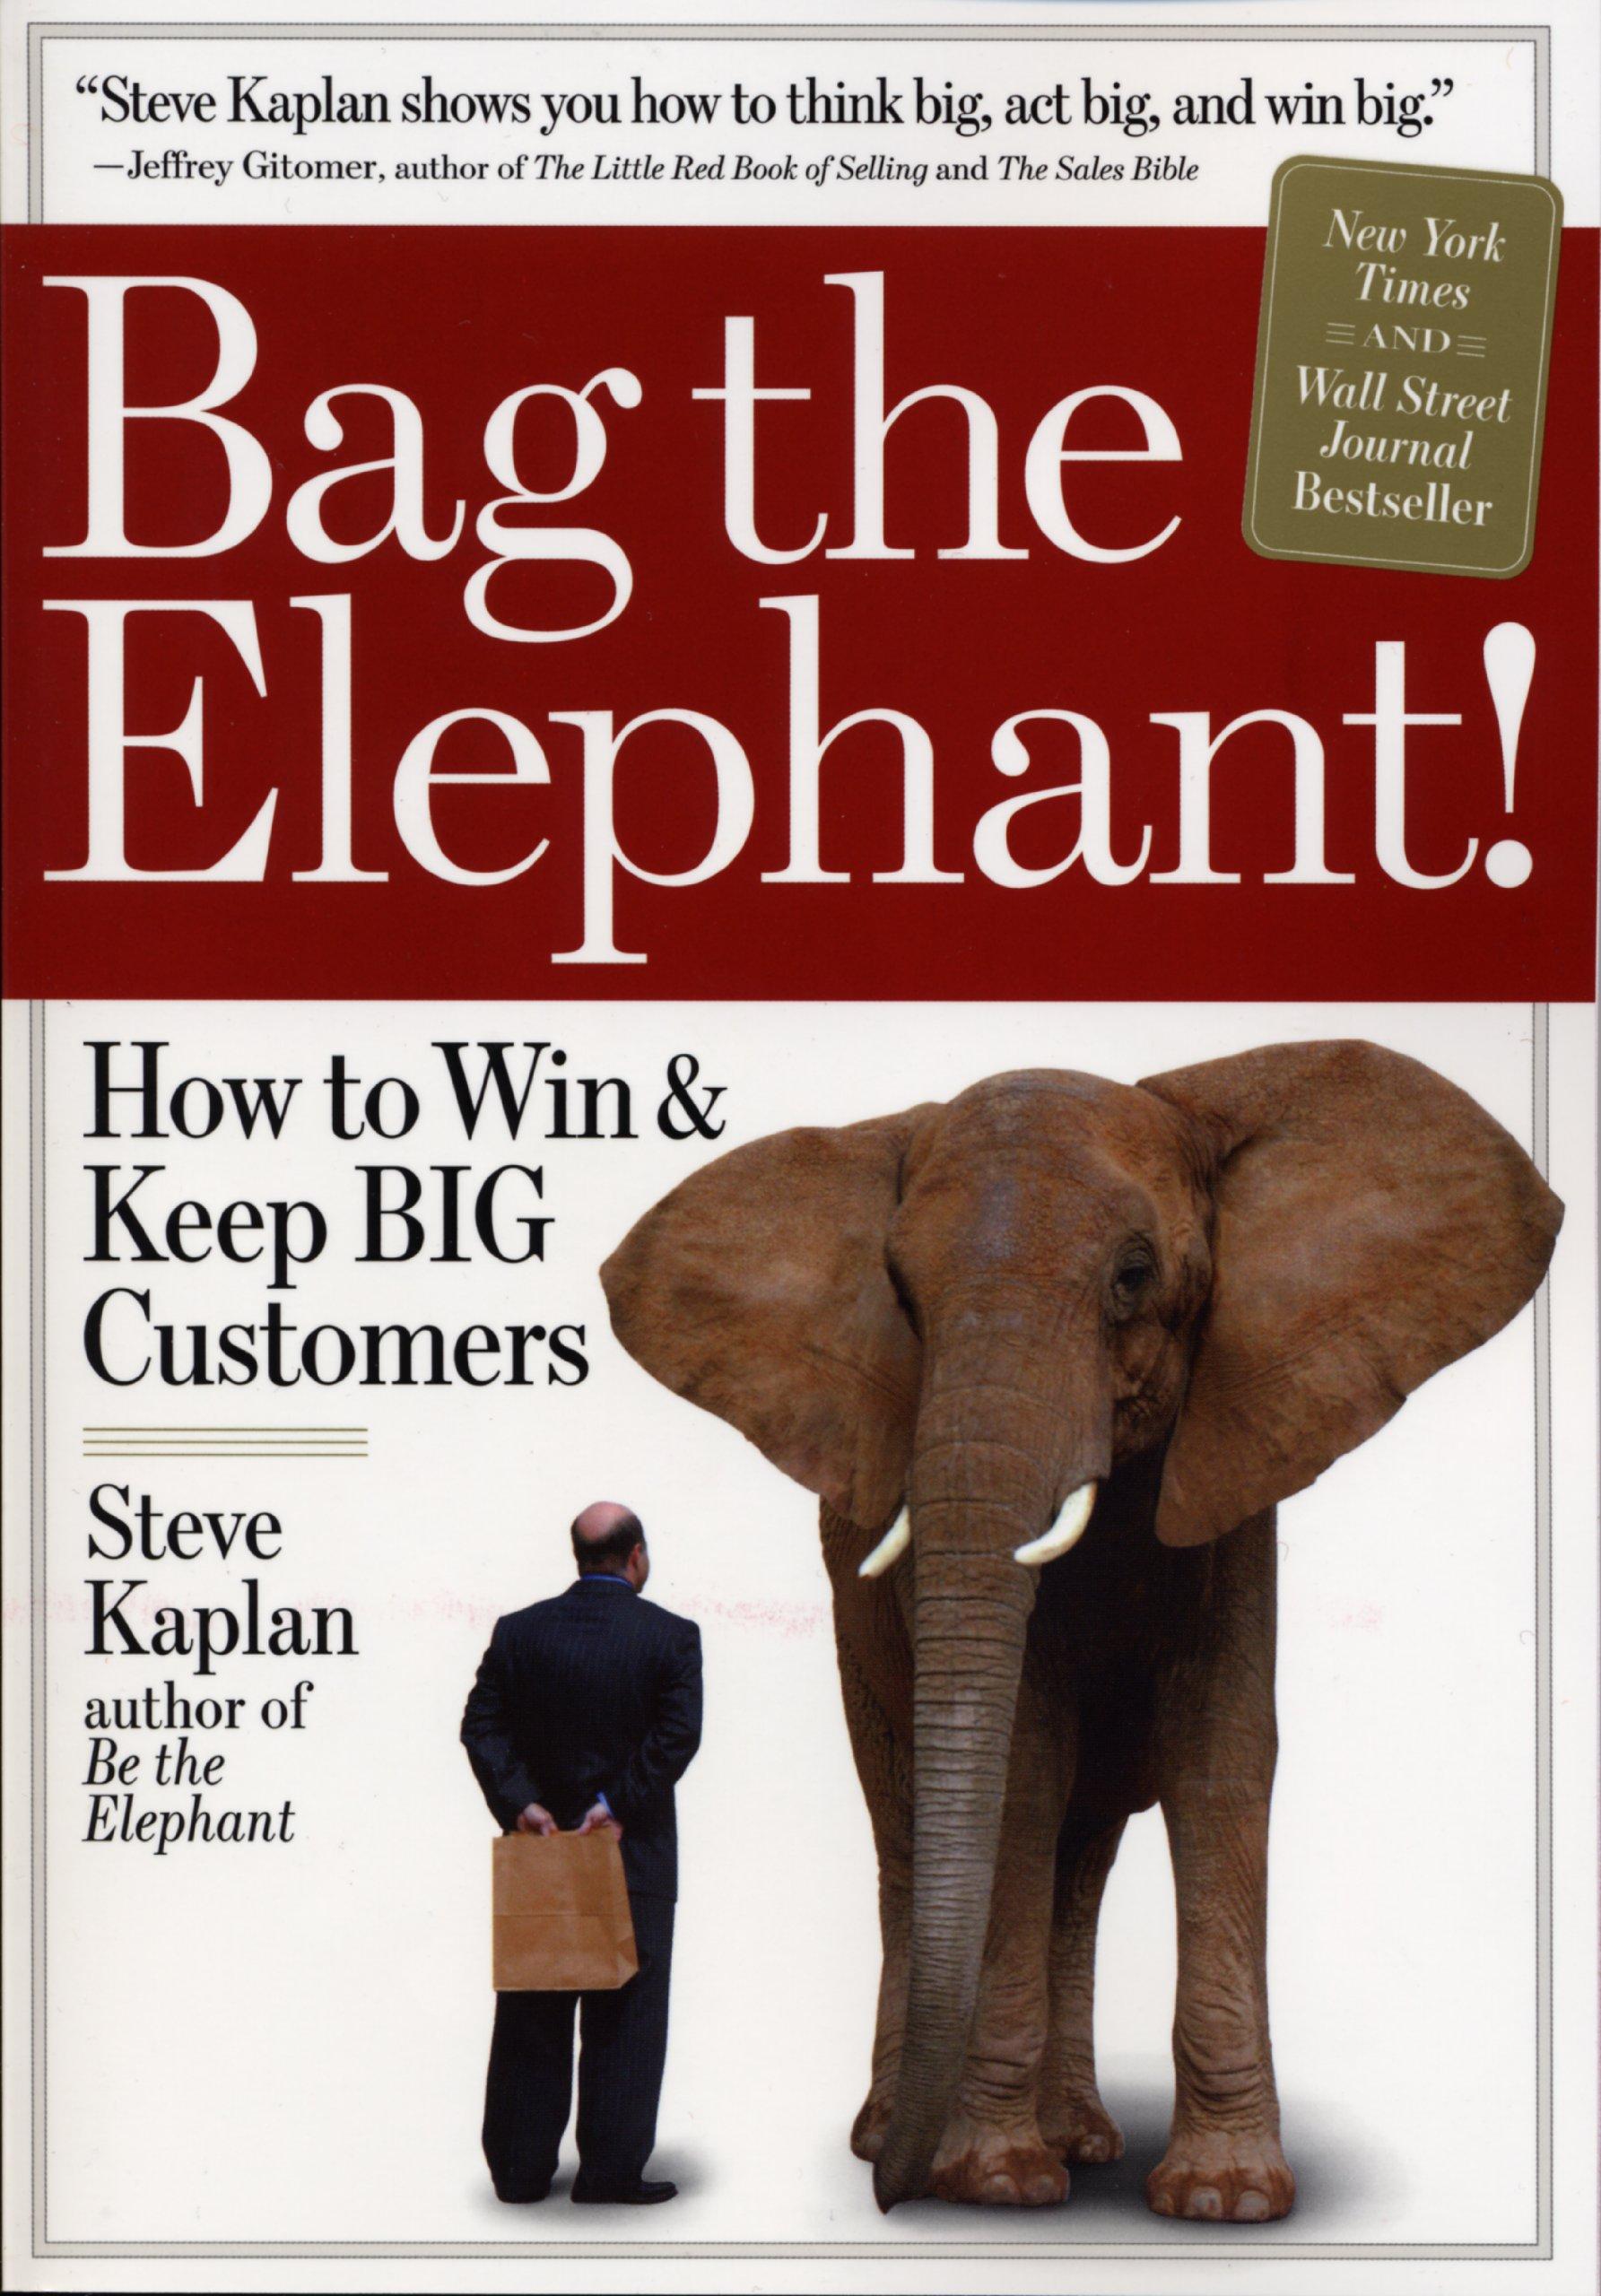 images of elephants.html